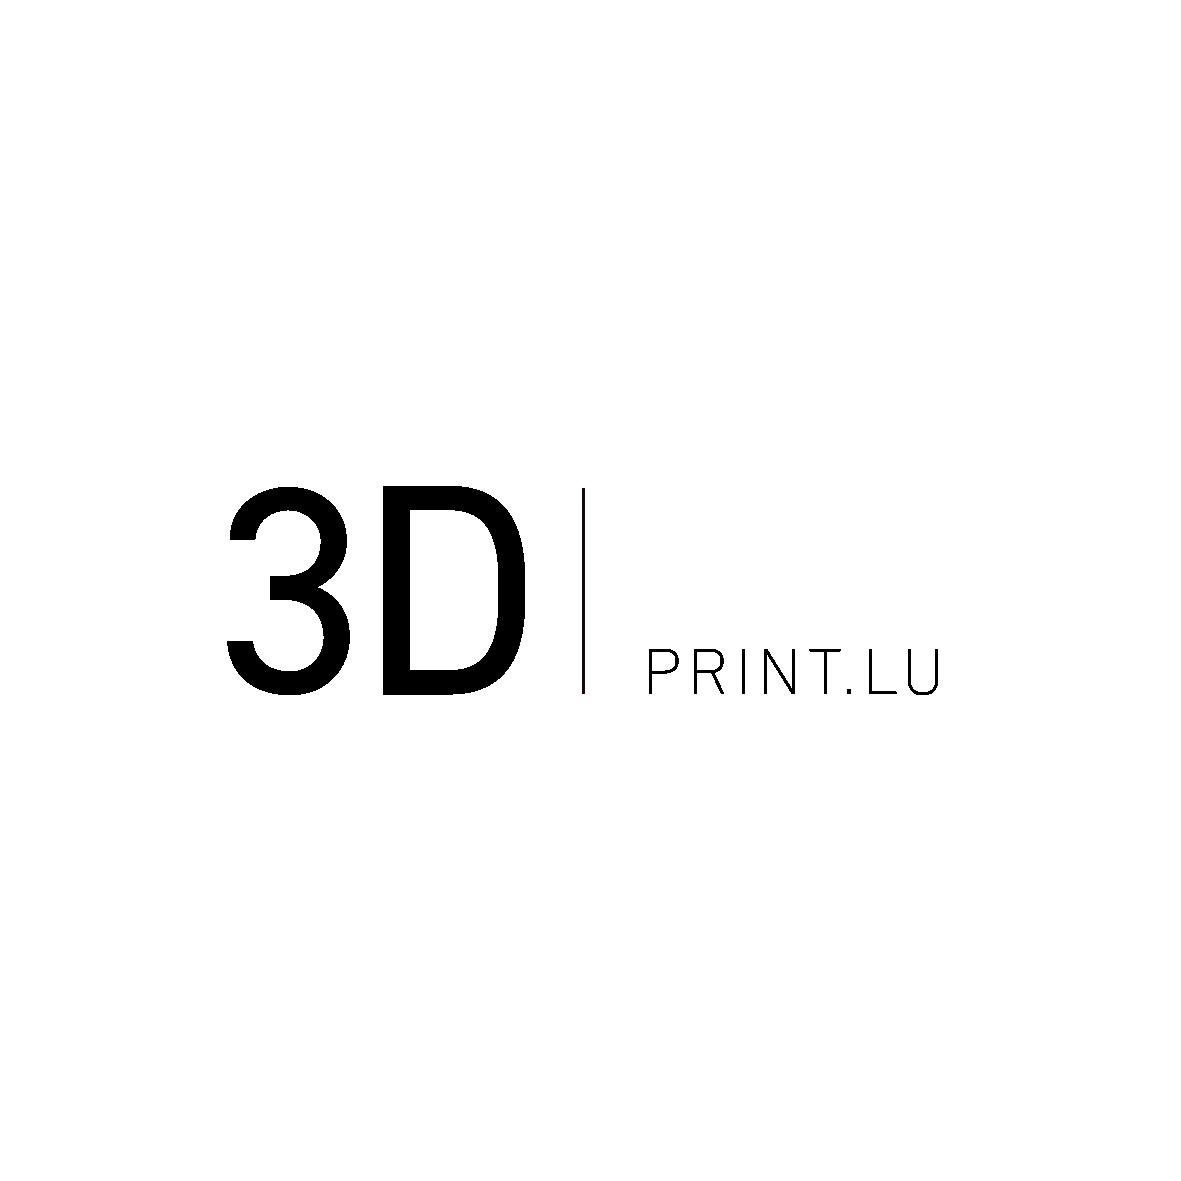 3DPrint.lu – AMSOL